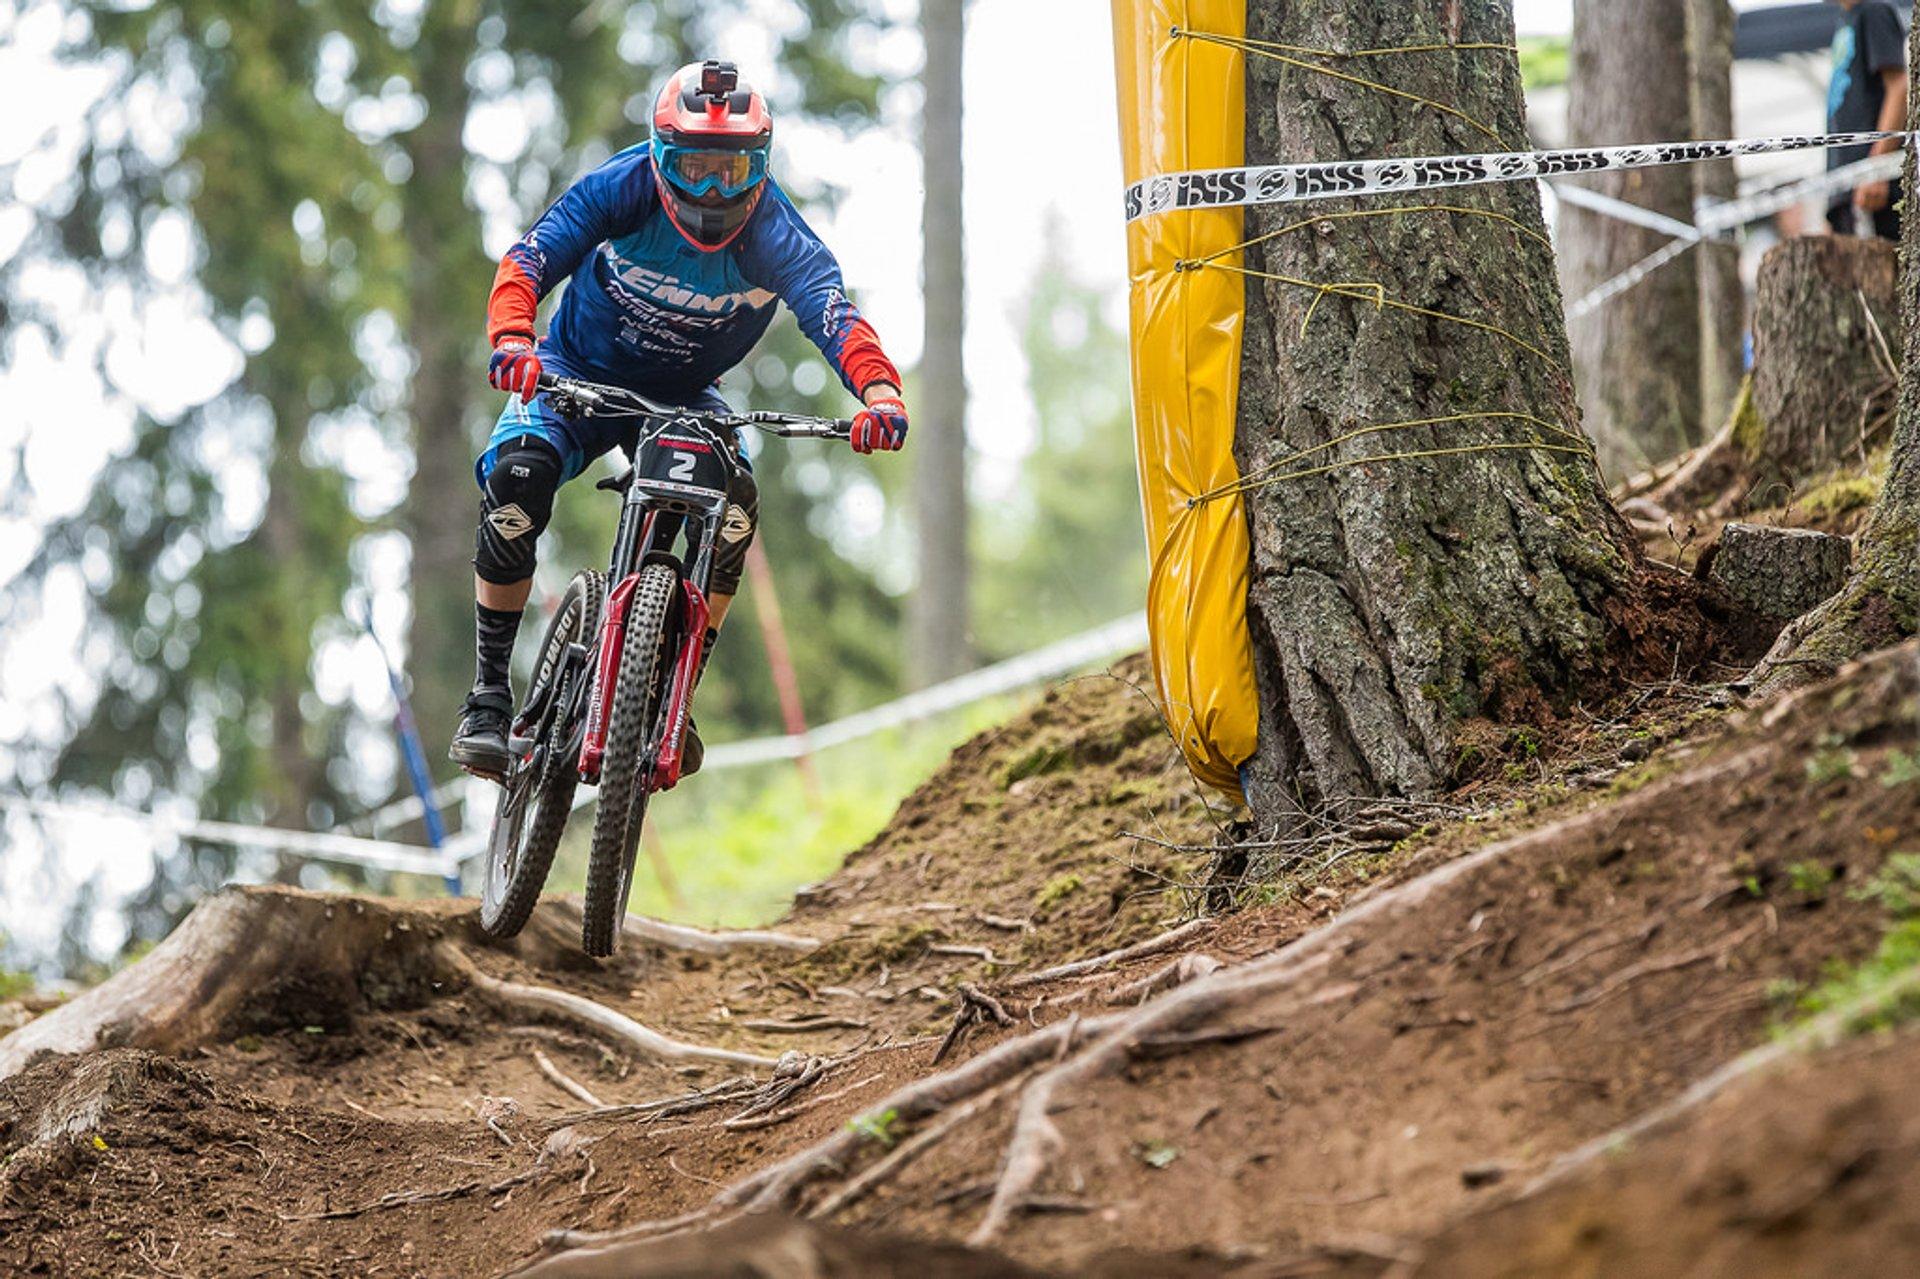 Crankworx Innsbruck - iXS Innsbruck Downhill presented by Raiffeisen Club 2019